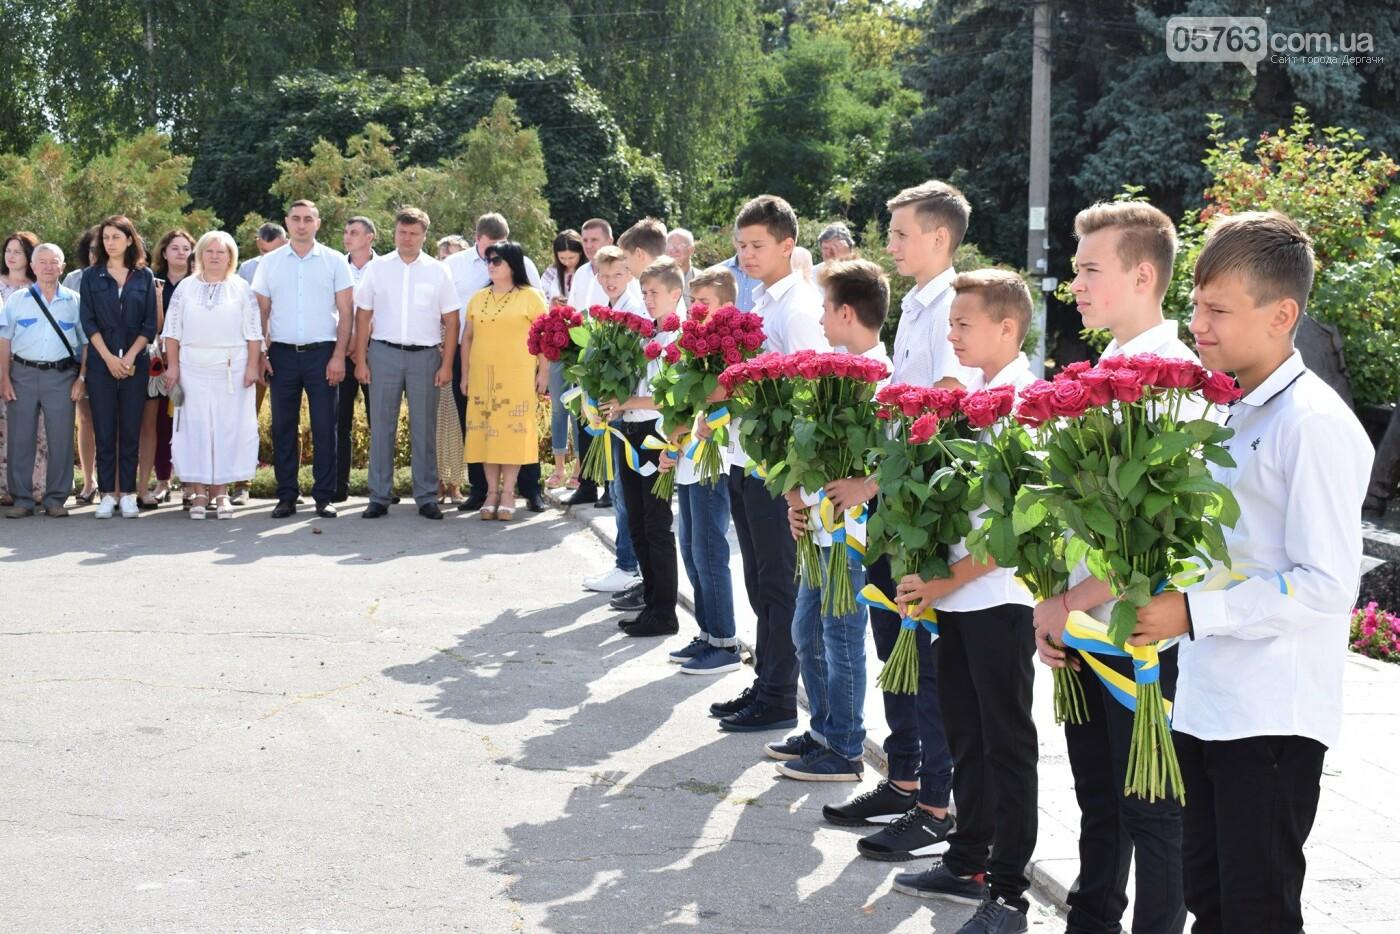 В Дергачах подняли флаг Украины (фото), фото-8